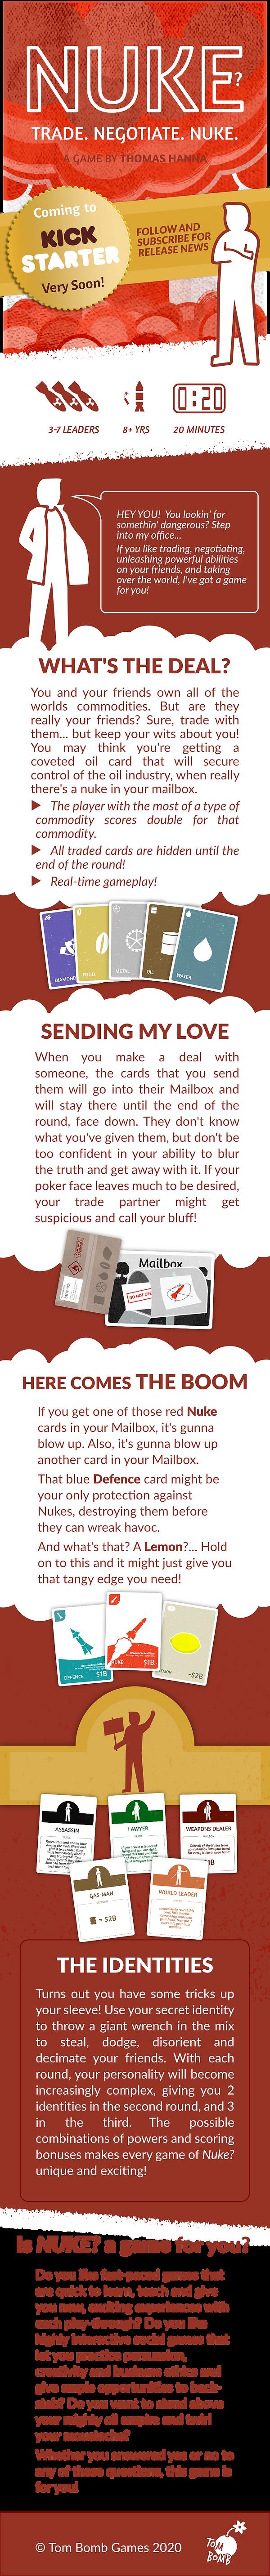 Nuke_Page_Mobile.png